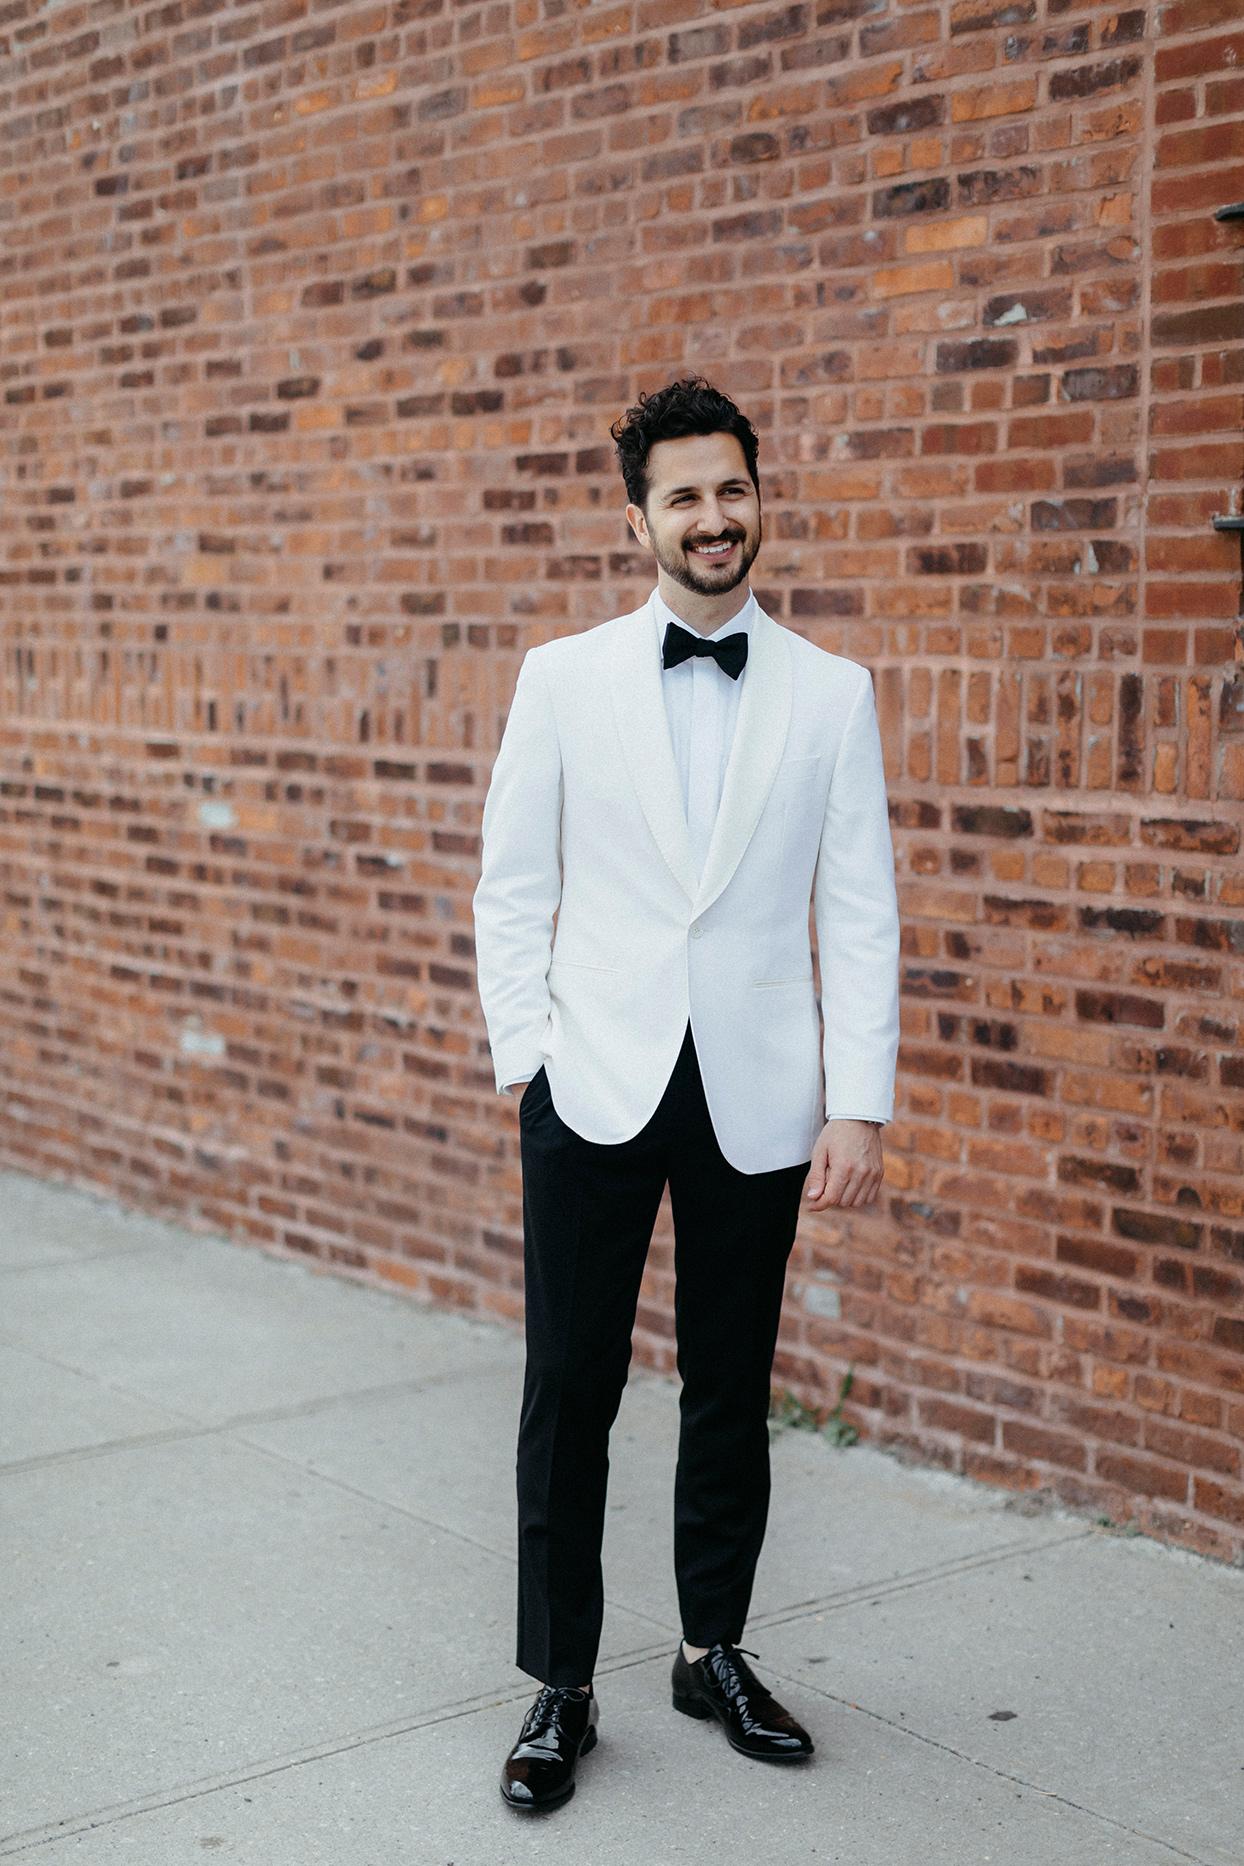 kristen jonathan wedding groom brick wall